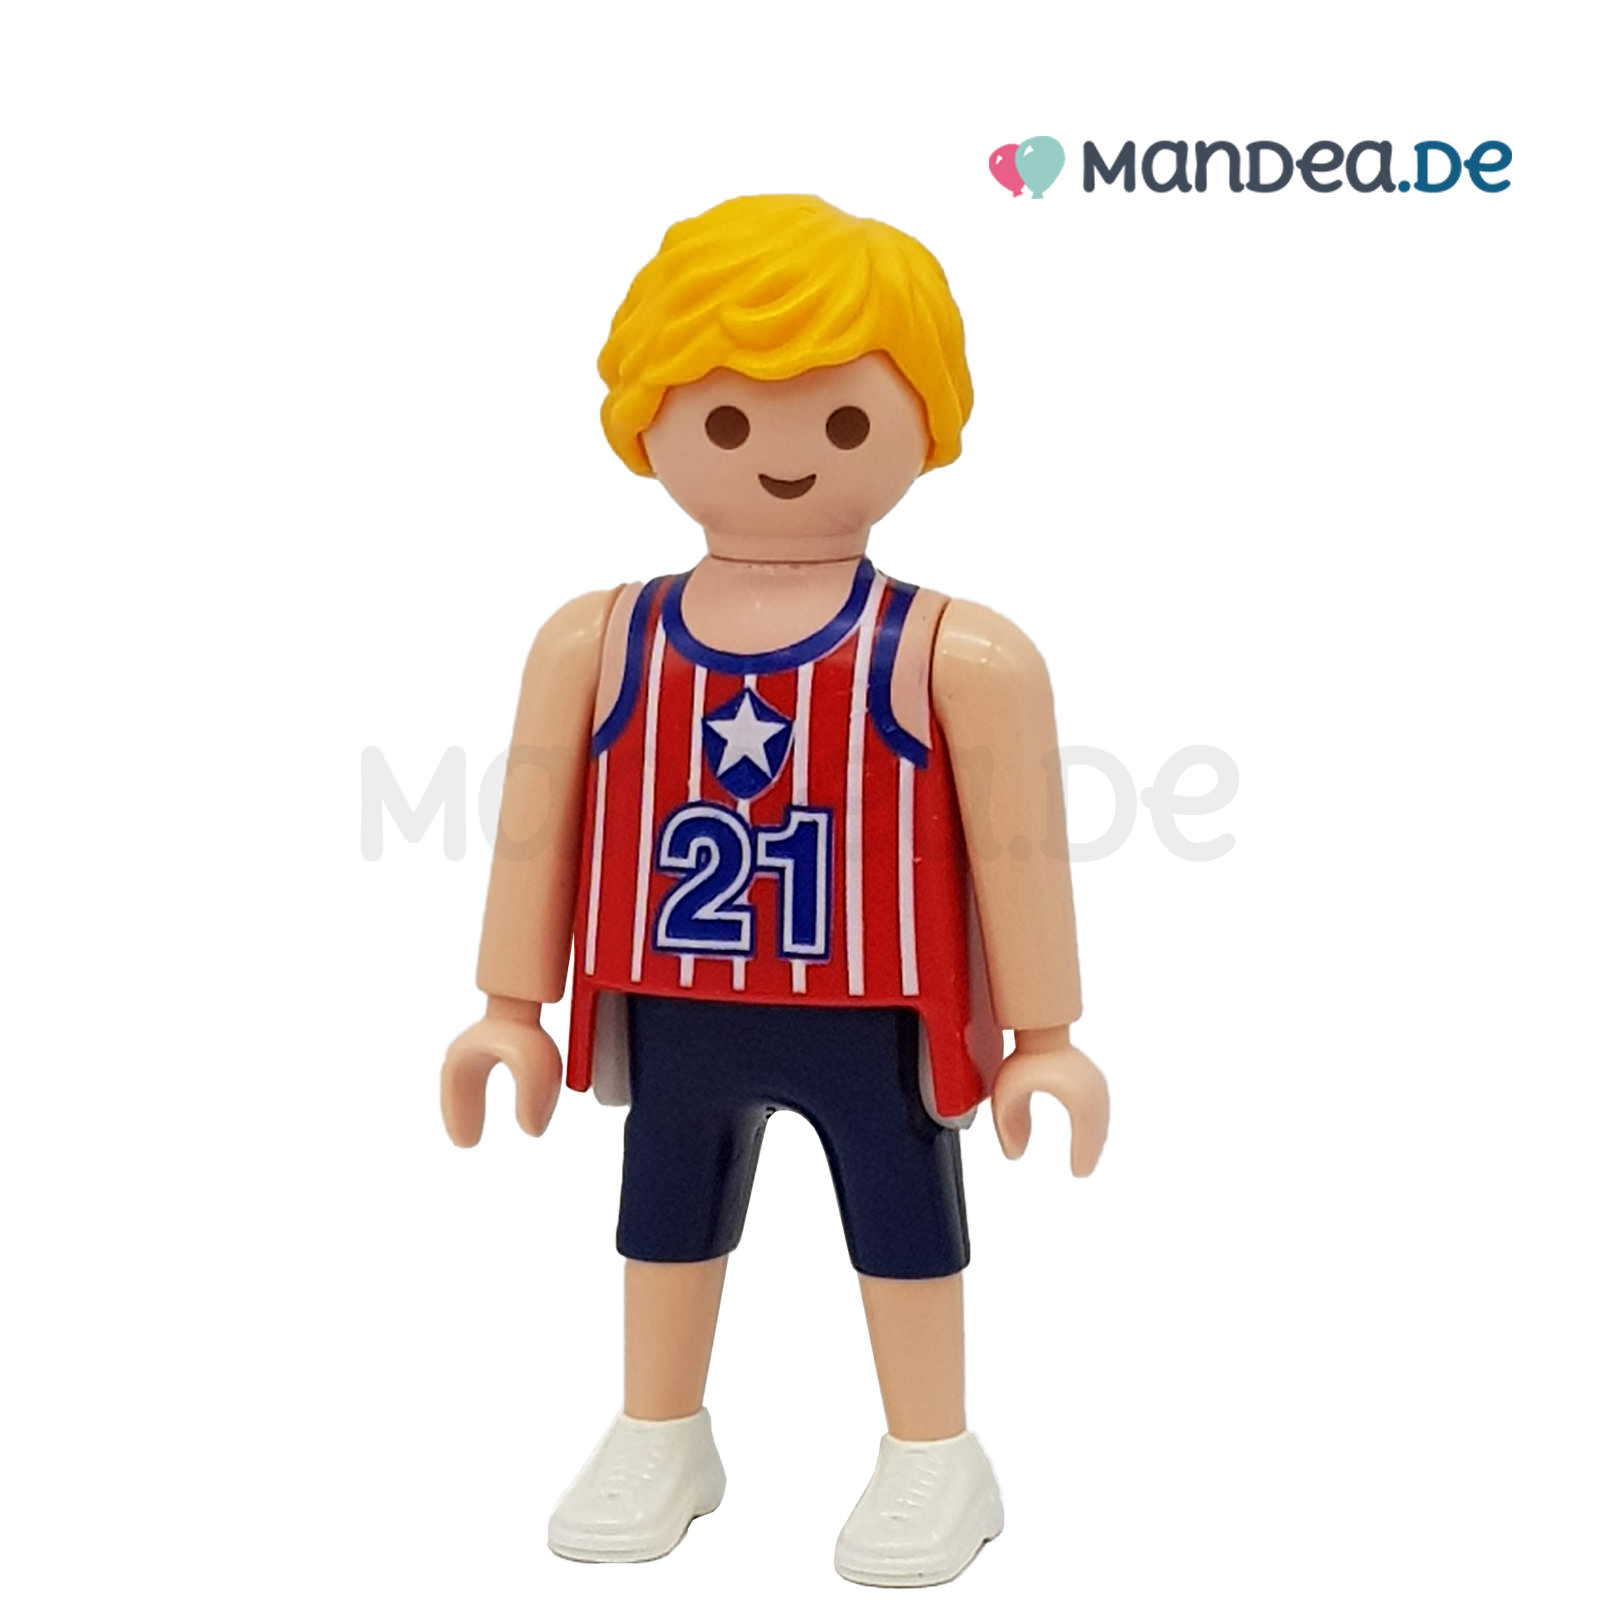 Playmobil Kinderzimmer Ersatzteile | Playmobil Fahrzeuge And ...